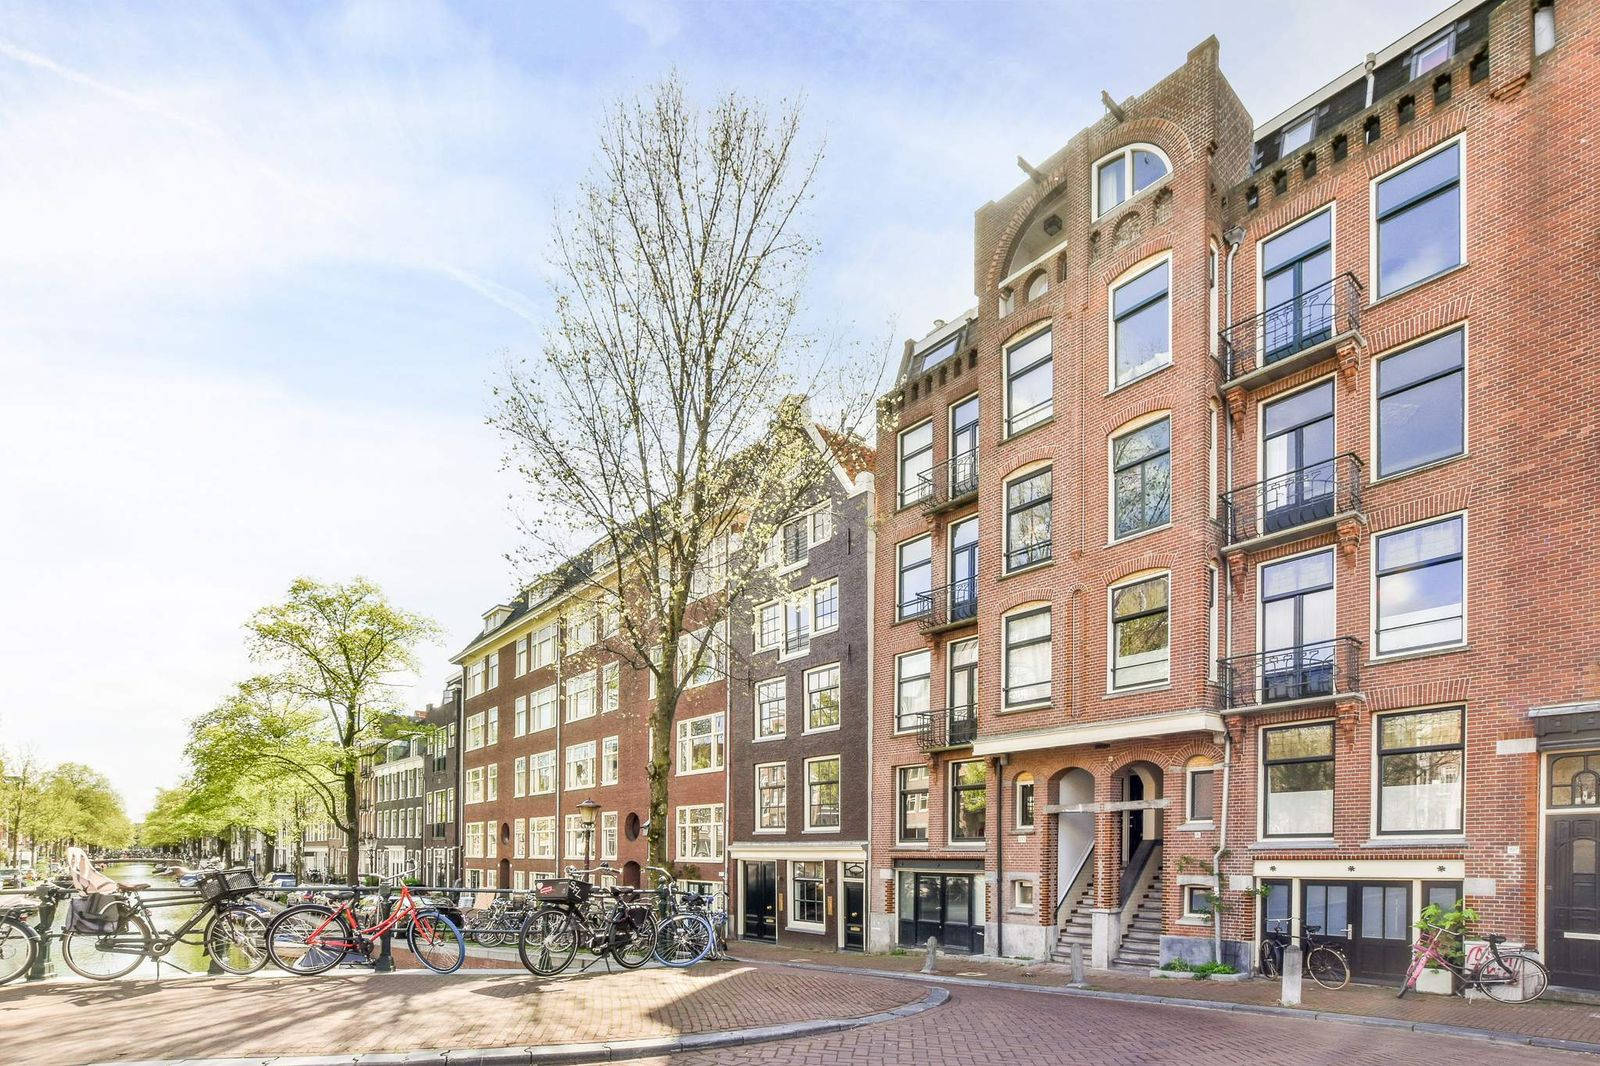 Bloemgracht 195-2, Amsterdam